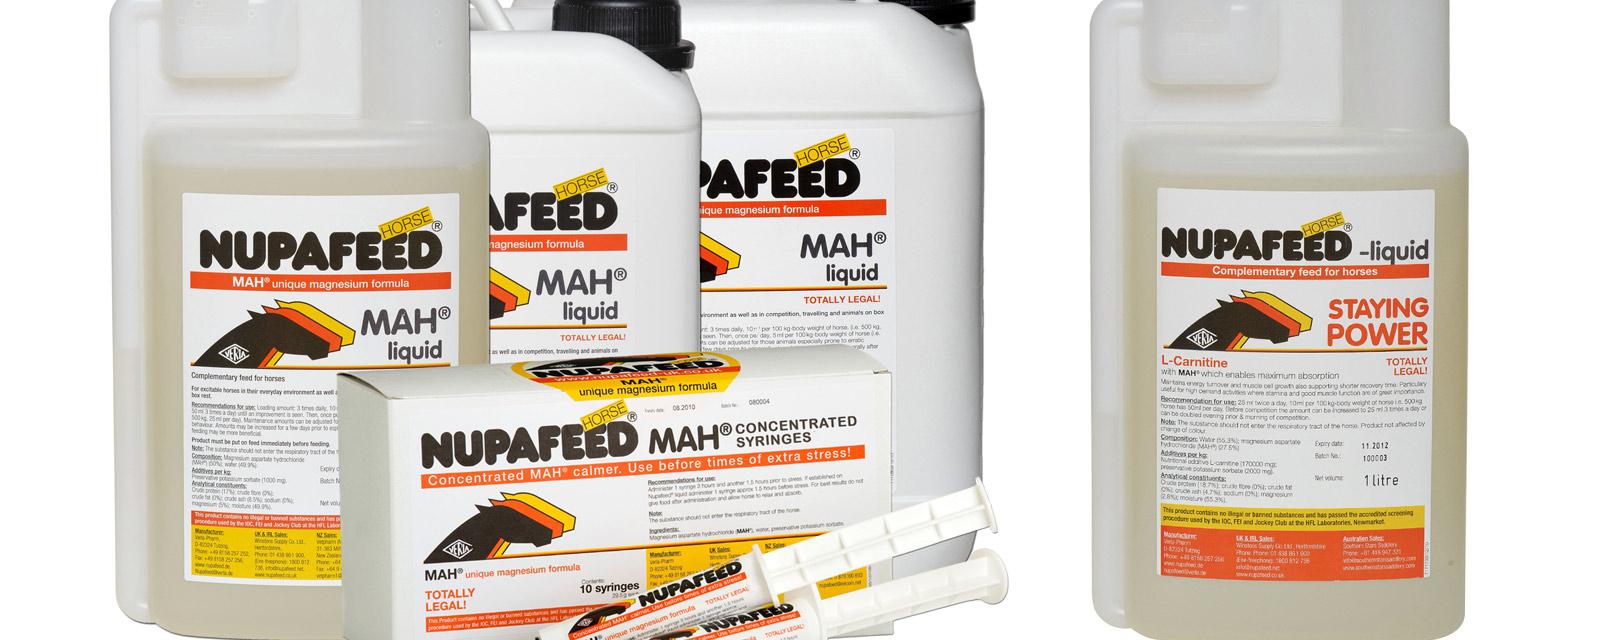 Nupafeed MAH Calmer Liquid & Staying Power Liquid